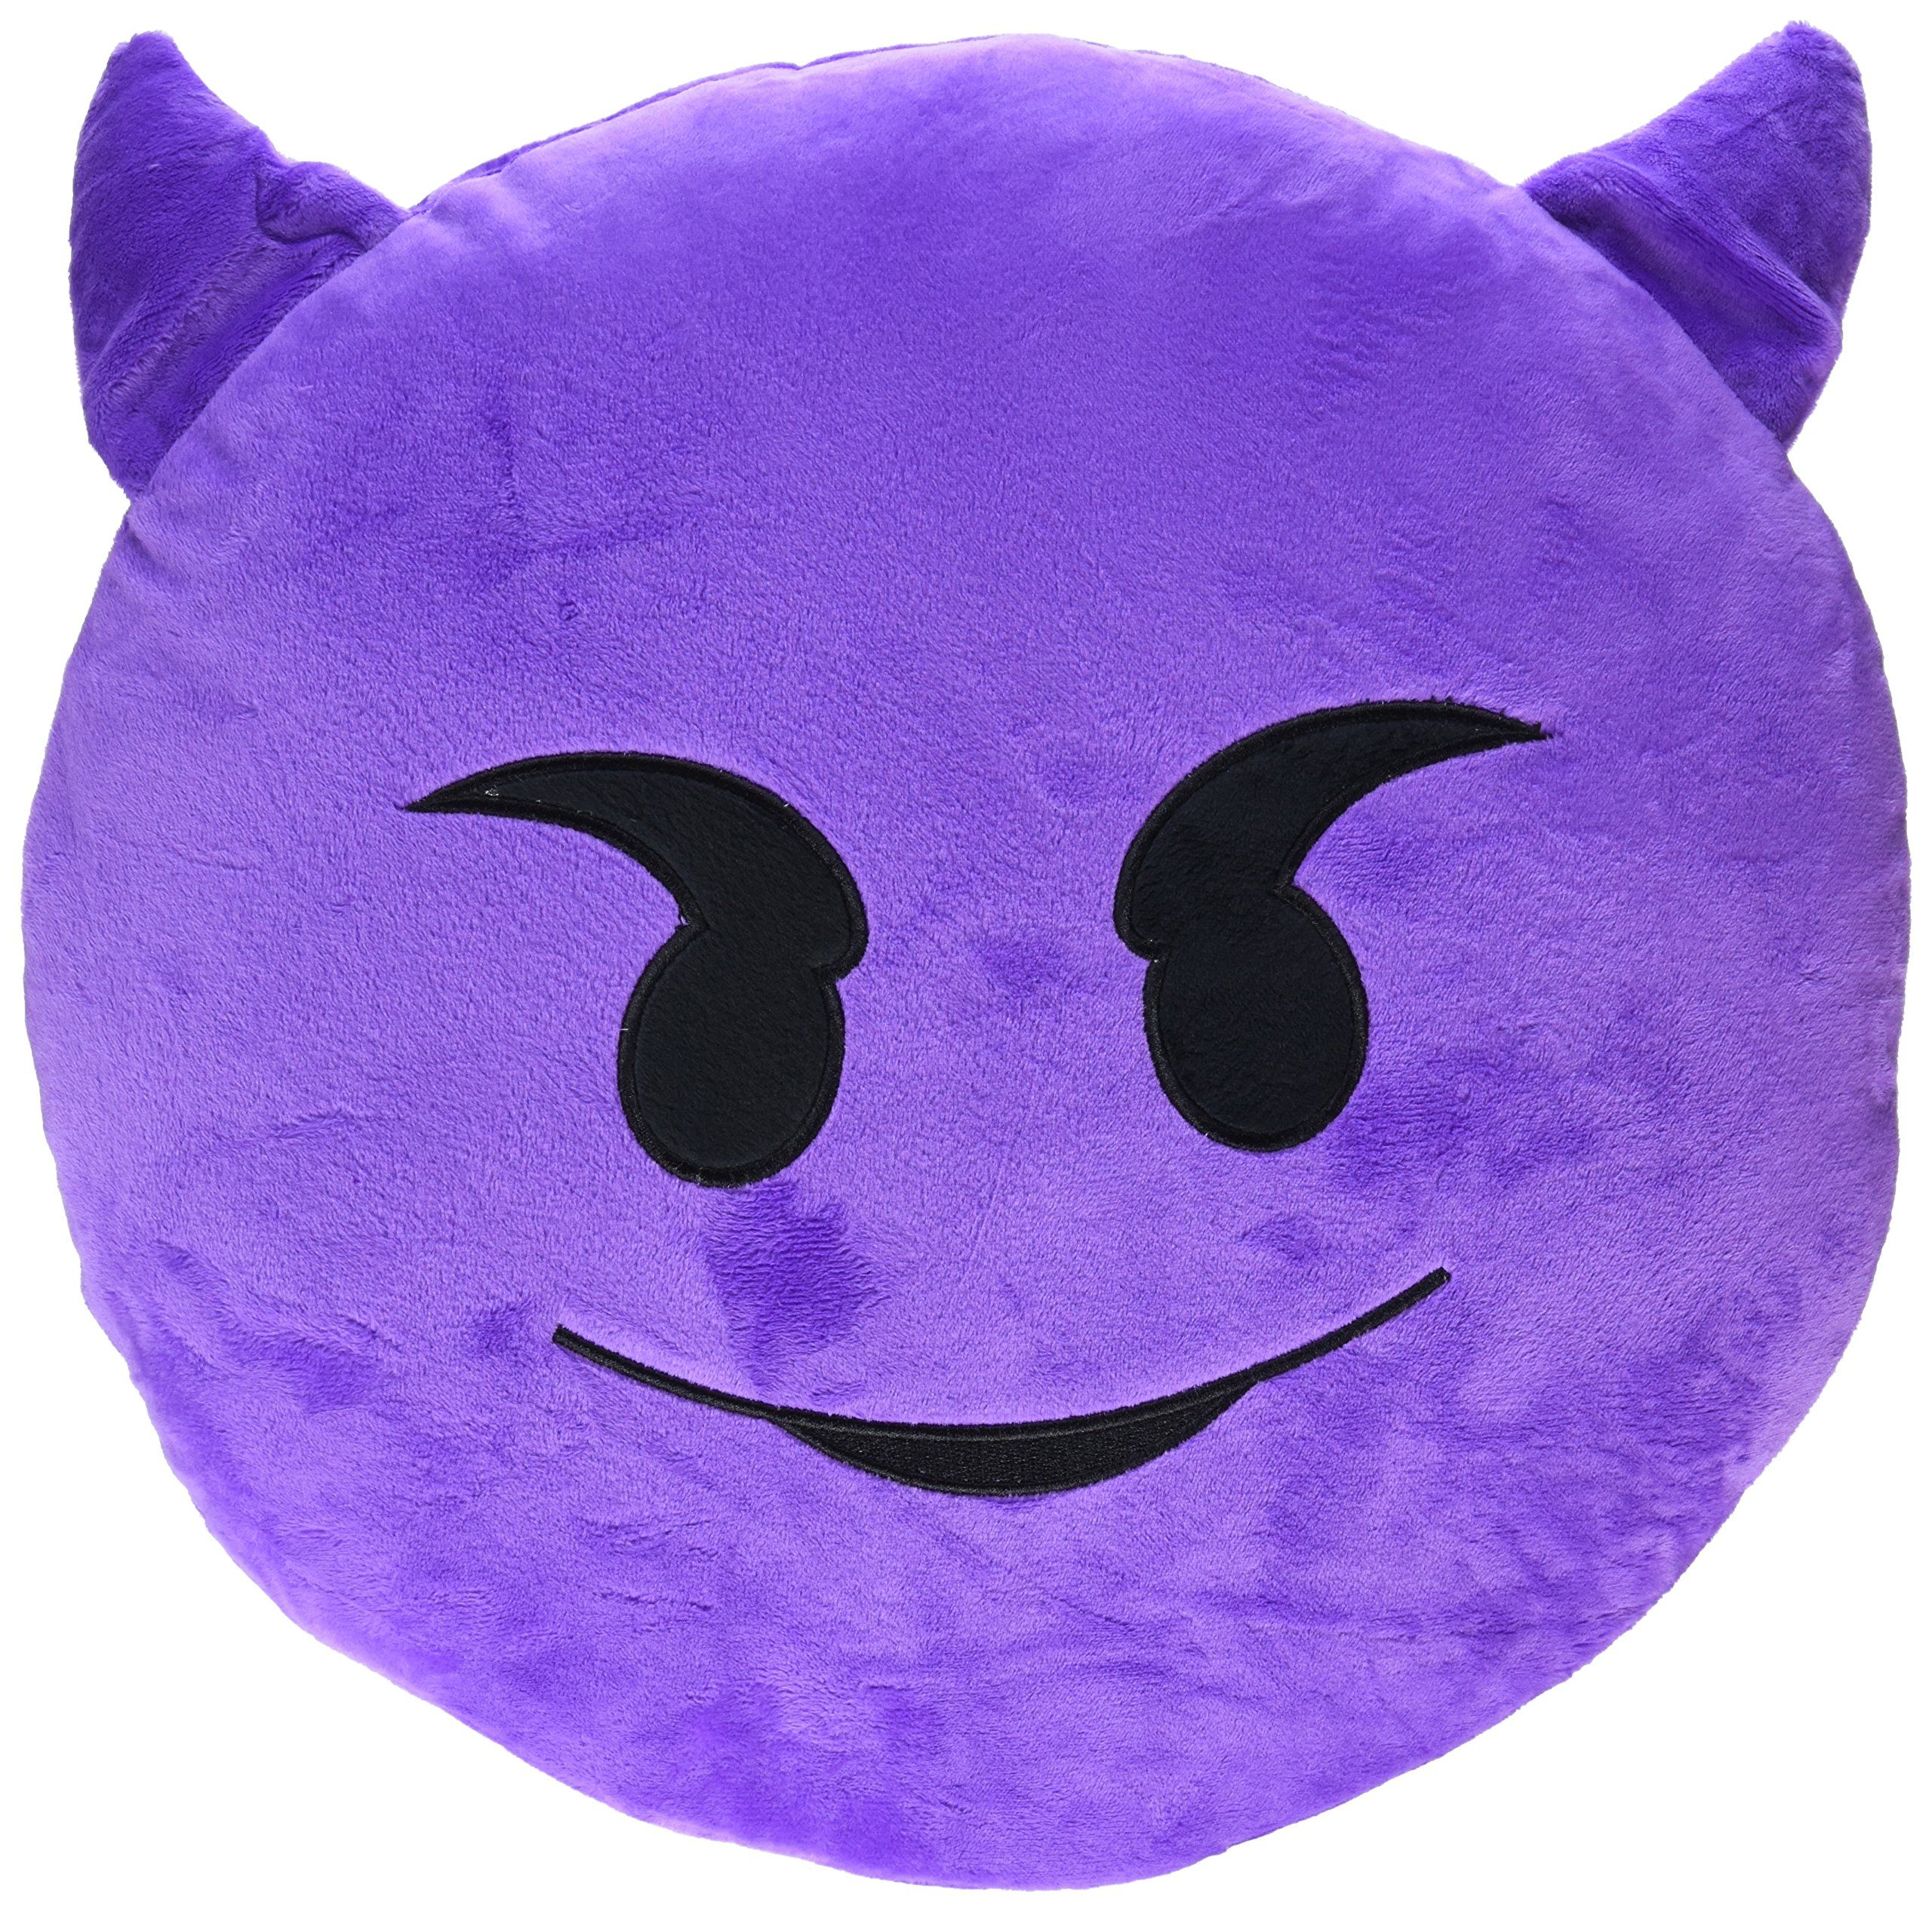 Bigoct emoji smiley emoticon round cushion stuffed pillow